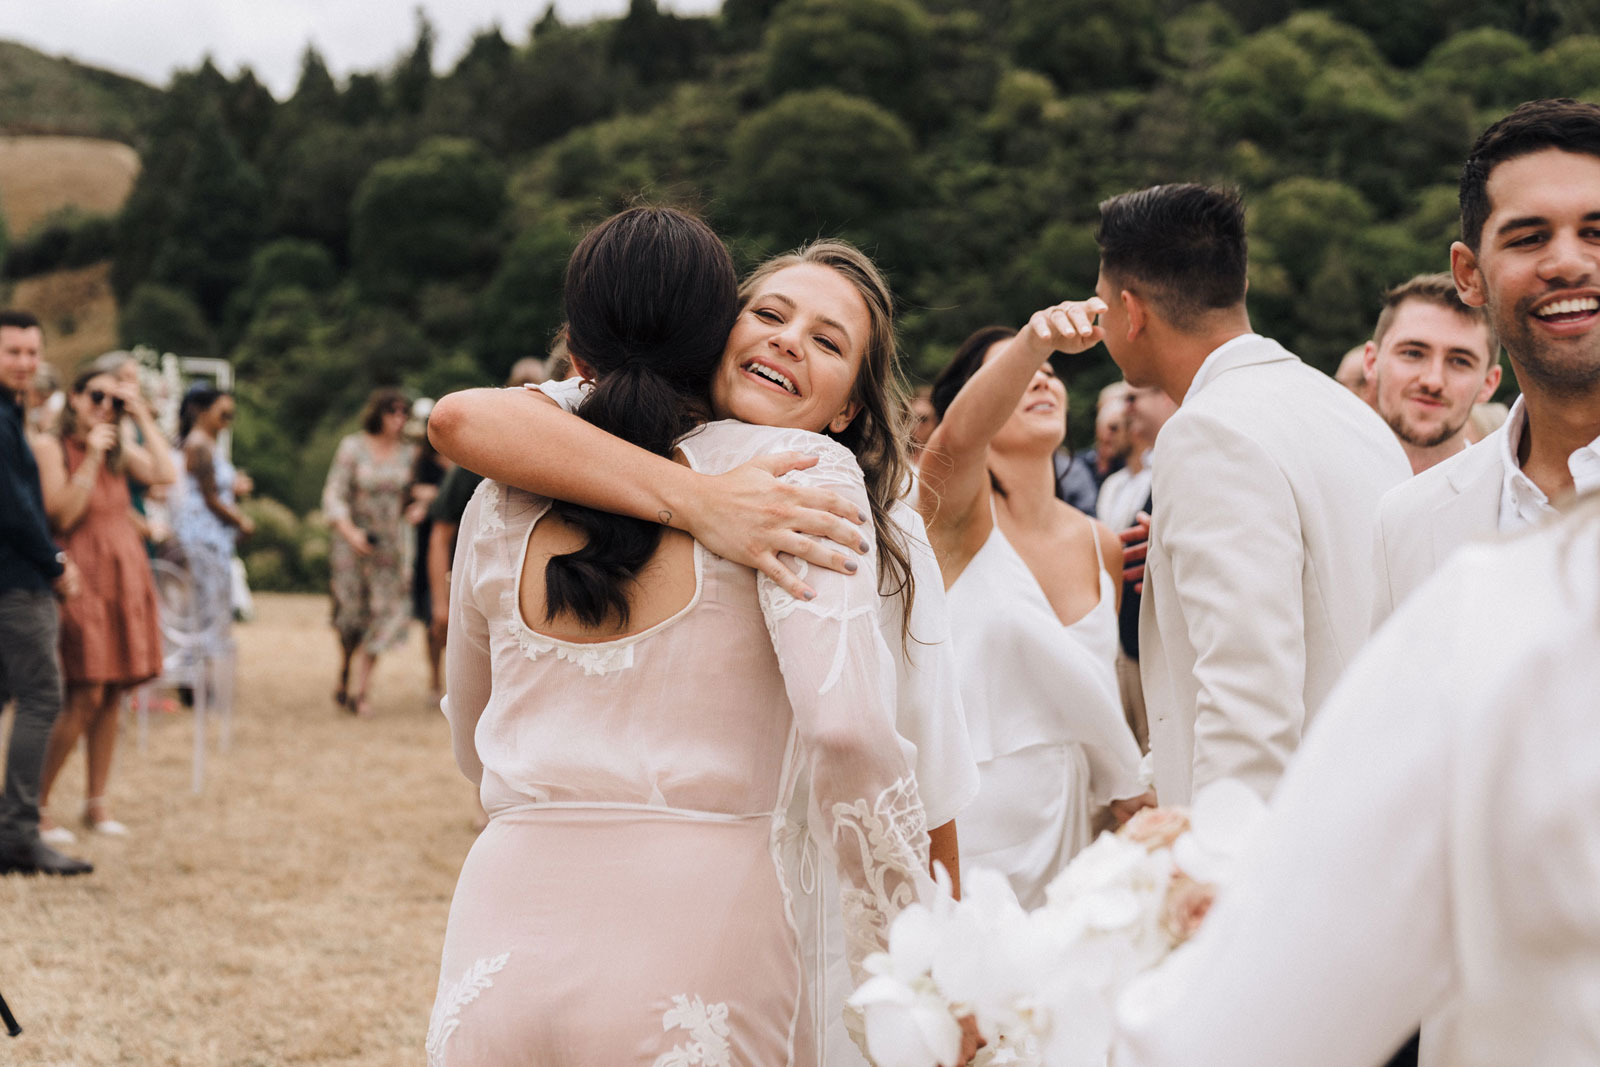 newfound-s-t-hunua-auckland-wedding-photographers-044